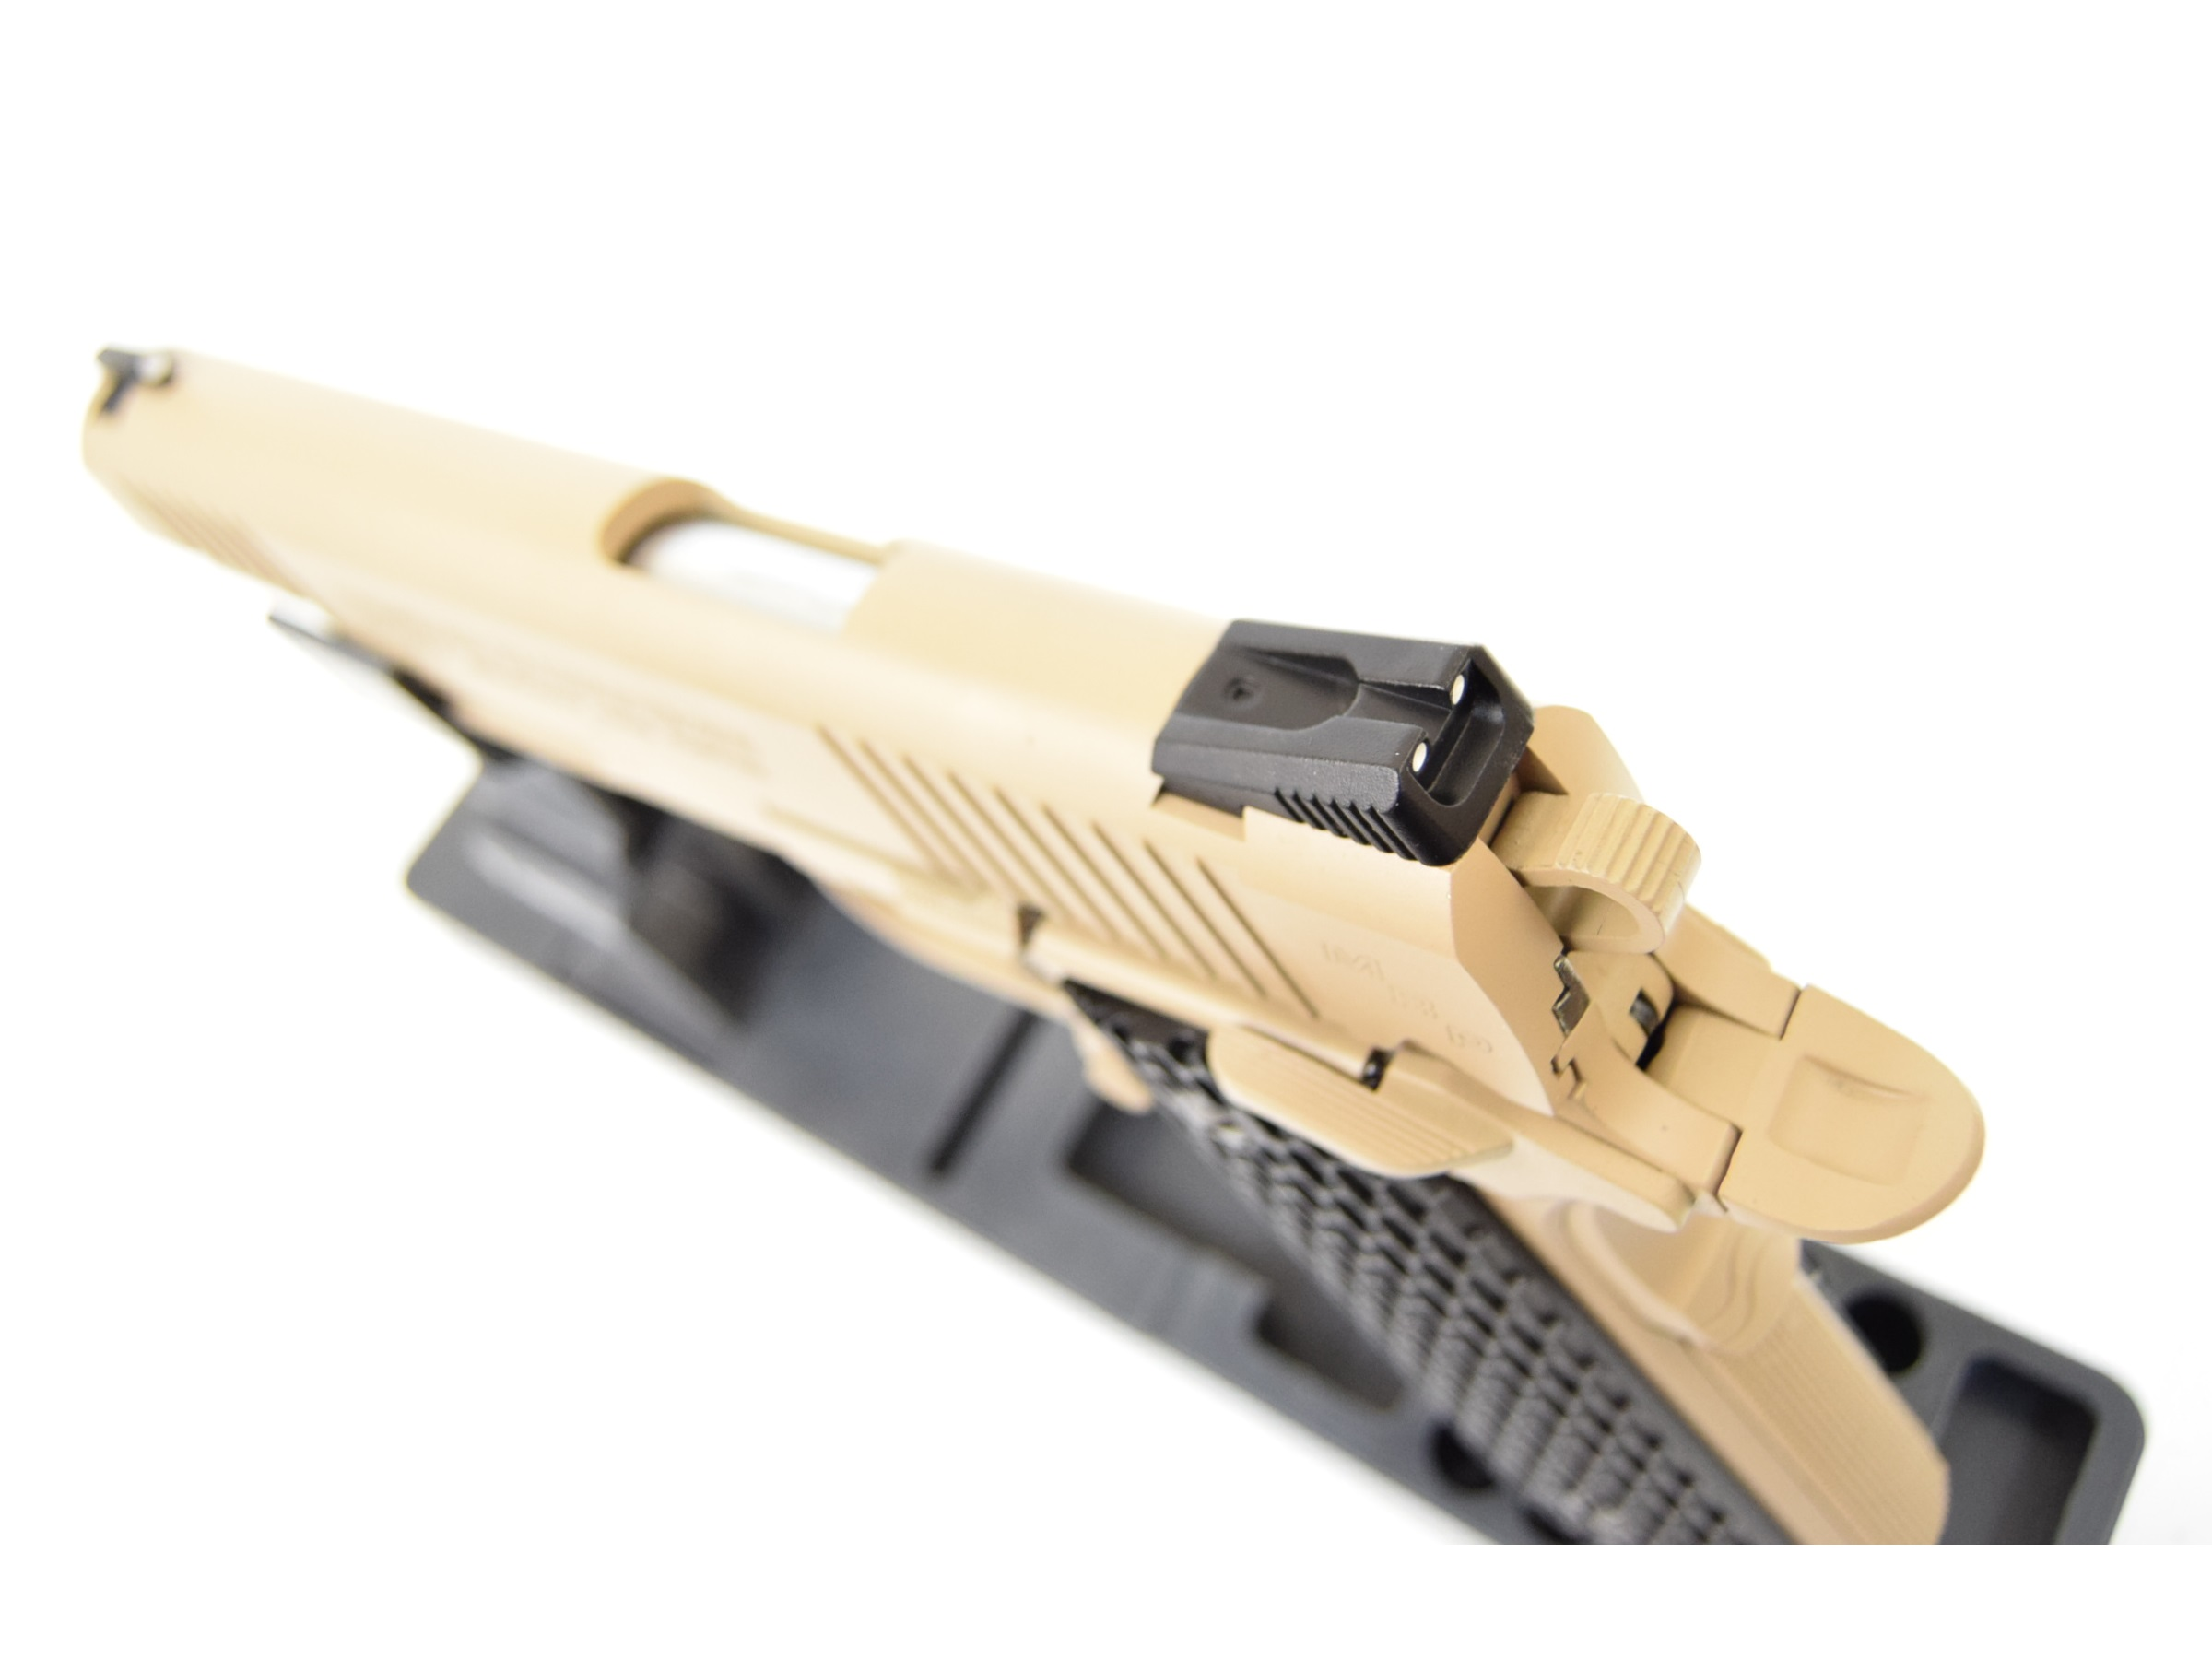 tan Swiss Arms TG-1